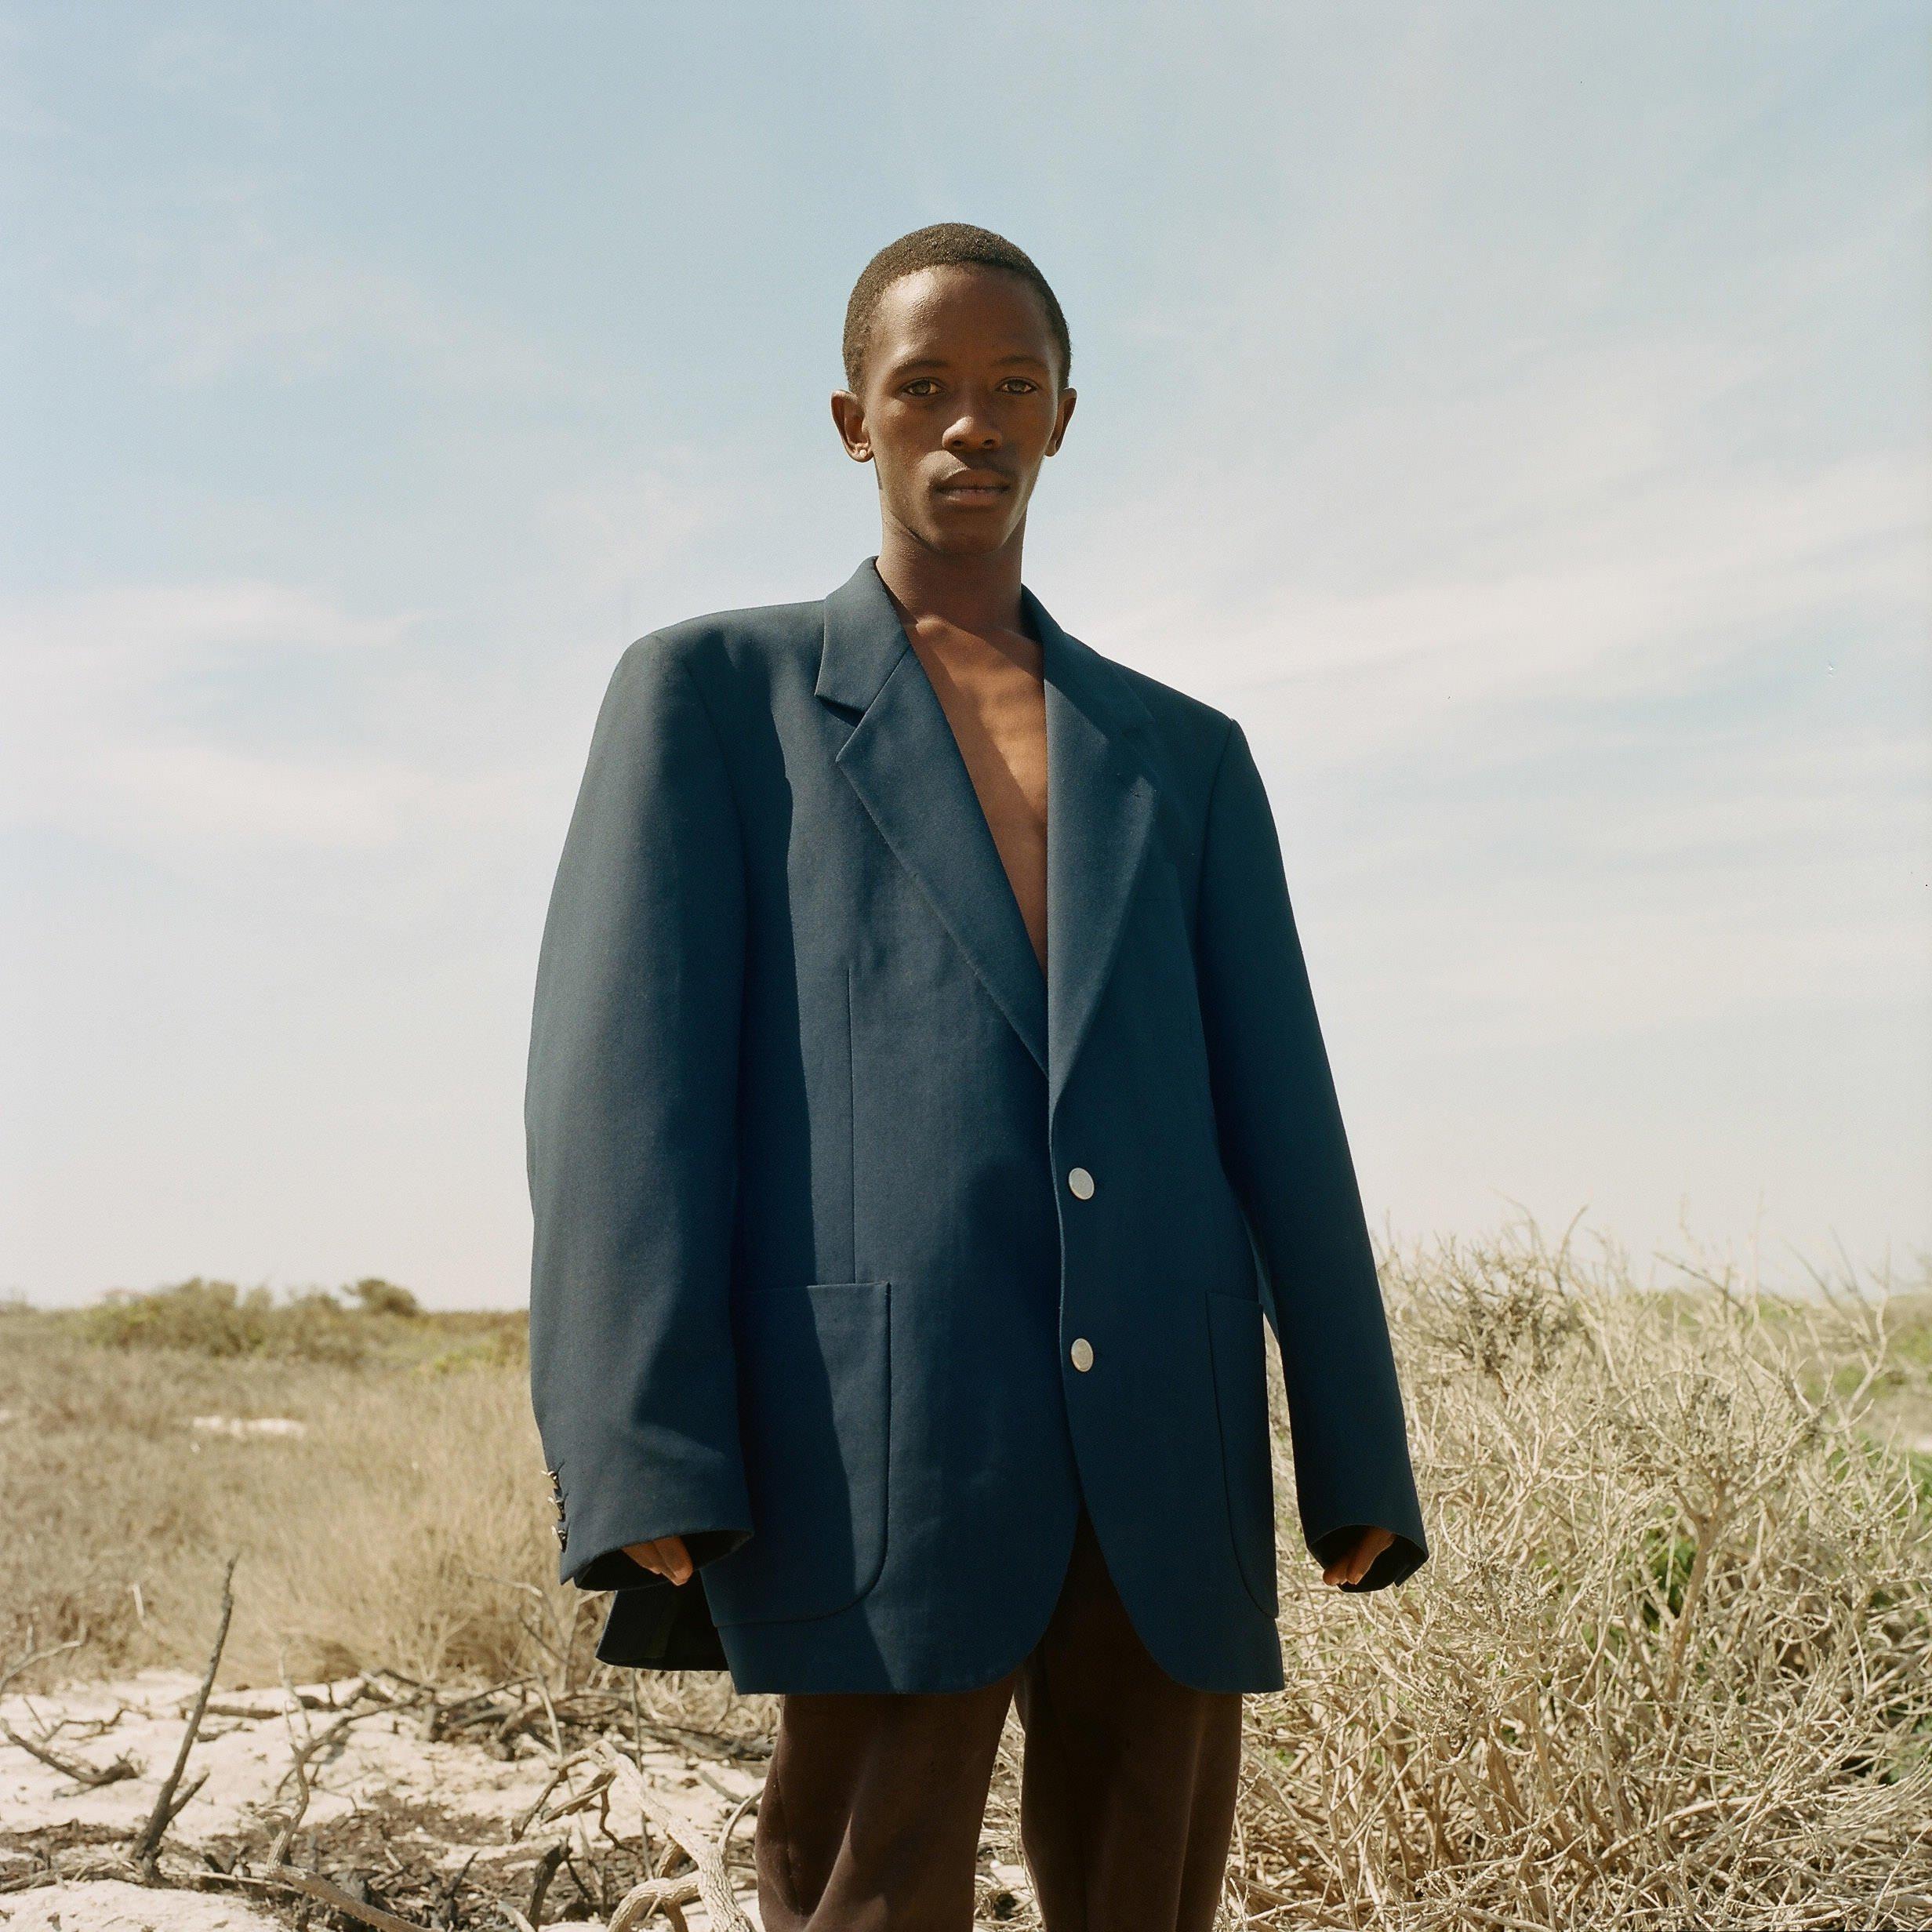 Portrait Photography, Justin Keene